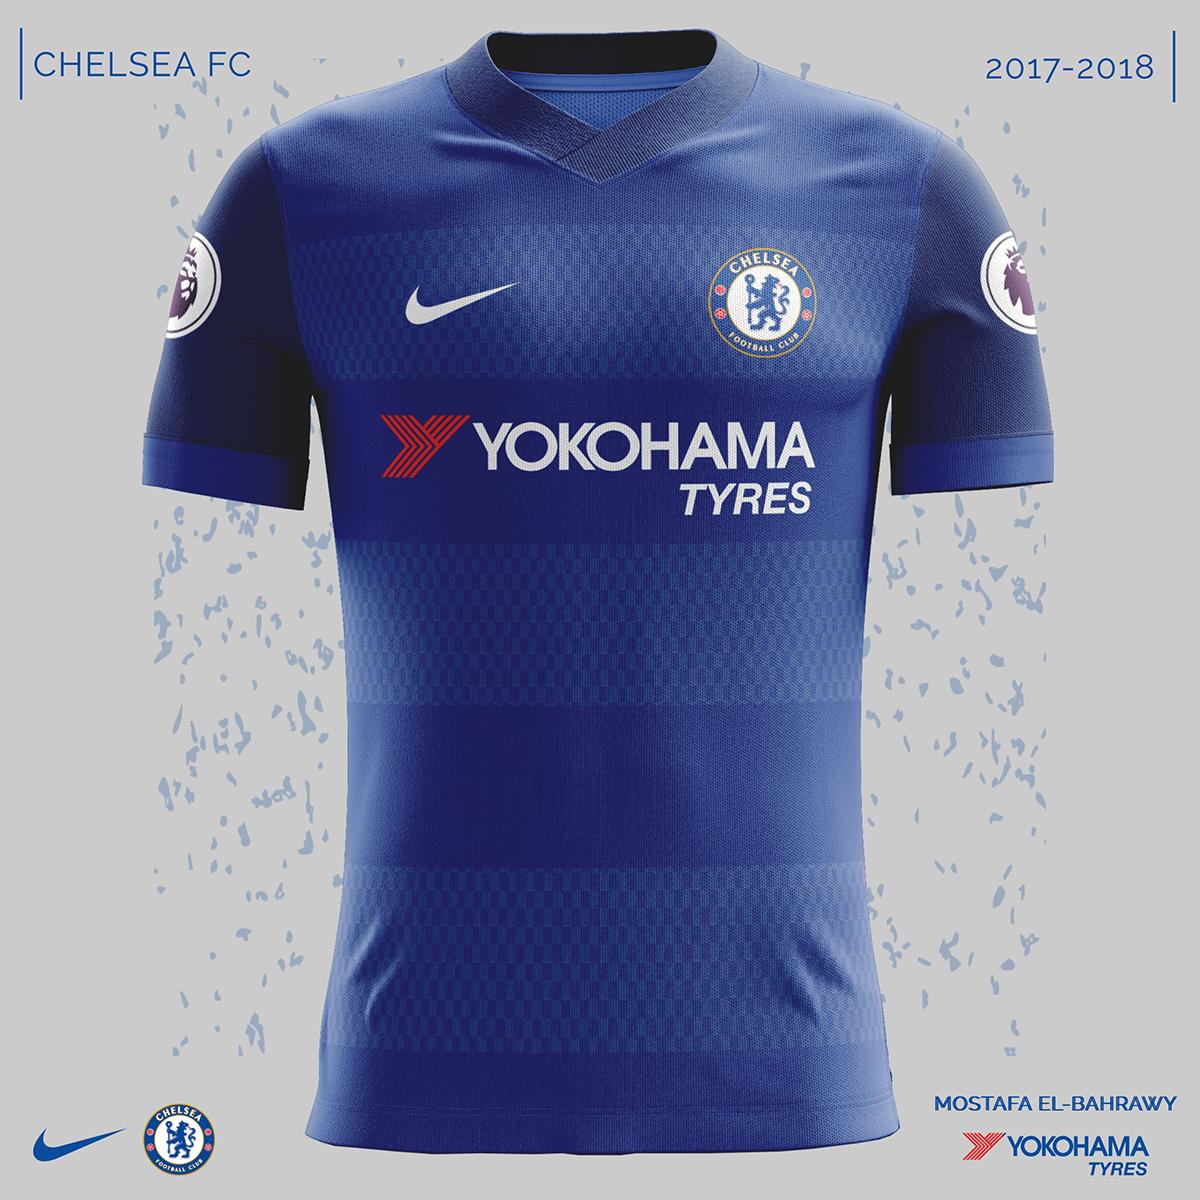 041bf13dbef Chelsea Nike Kits (2017-2018) on Behance